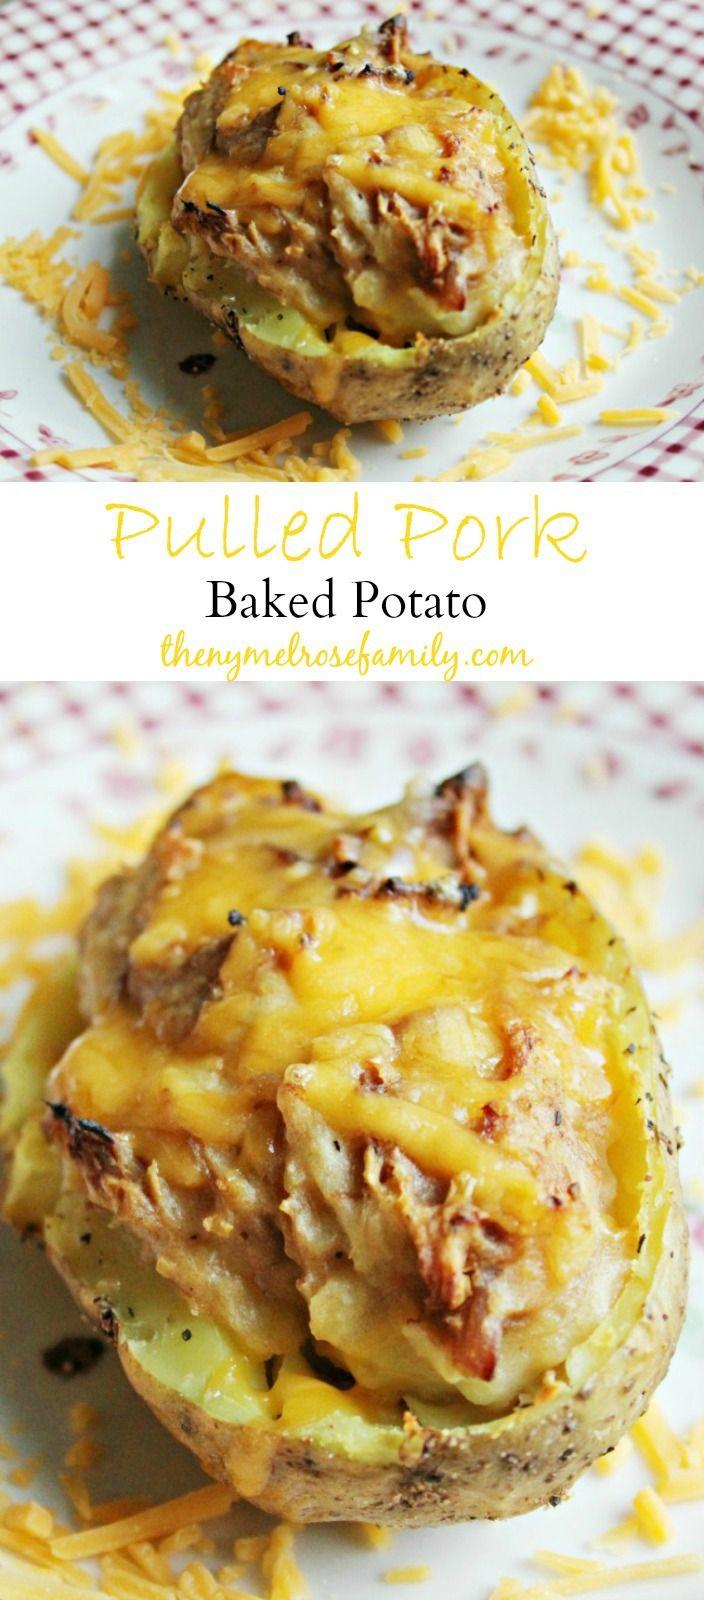 Leftover Baked Potato Recipes  8278 best Foods and Beverages images on Pinterest